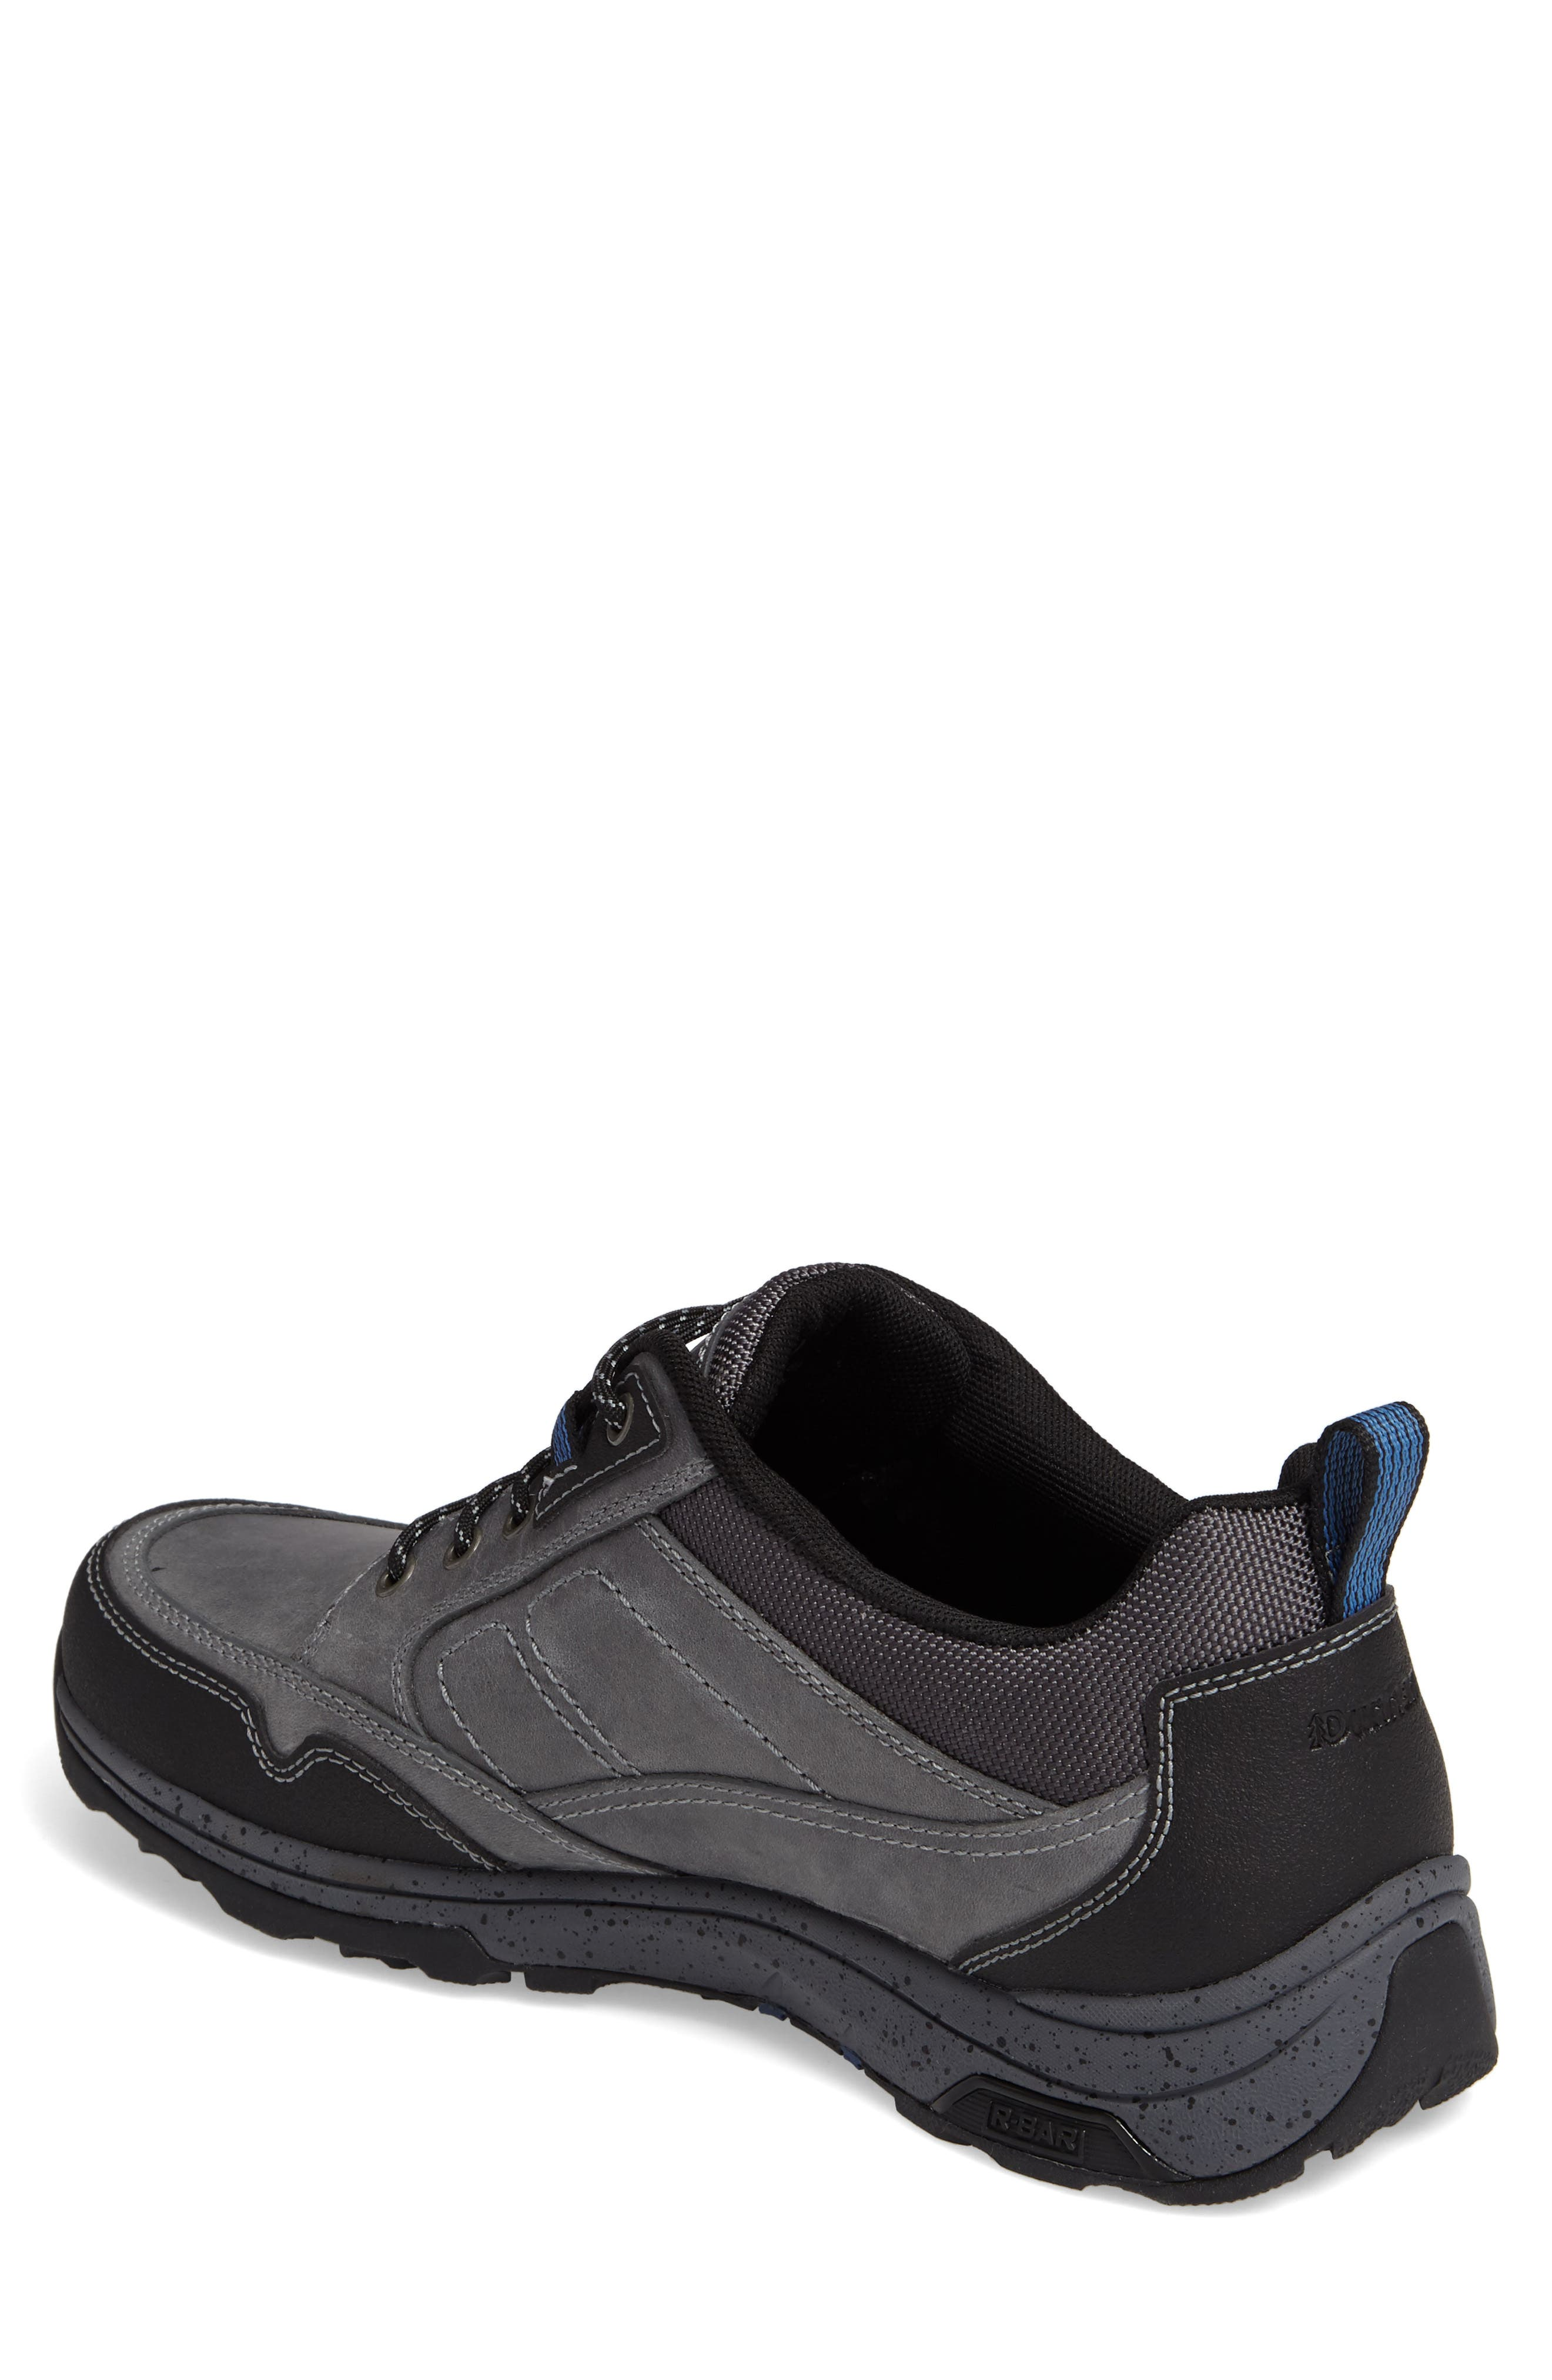 Trukka Hiking Shoe,                             Alternate thumbnail 2, color,                             GREY